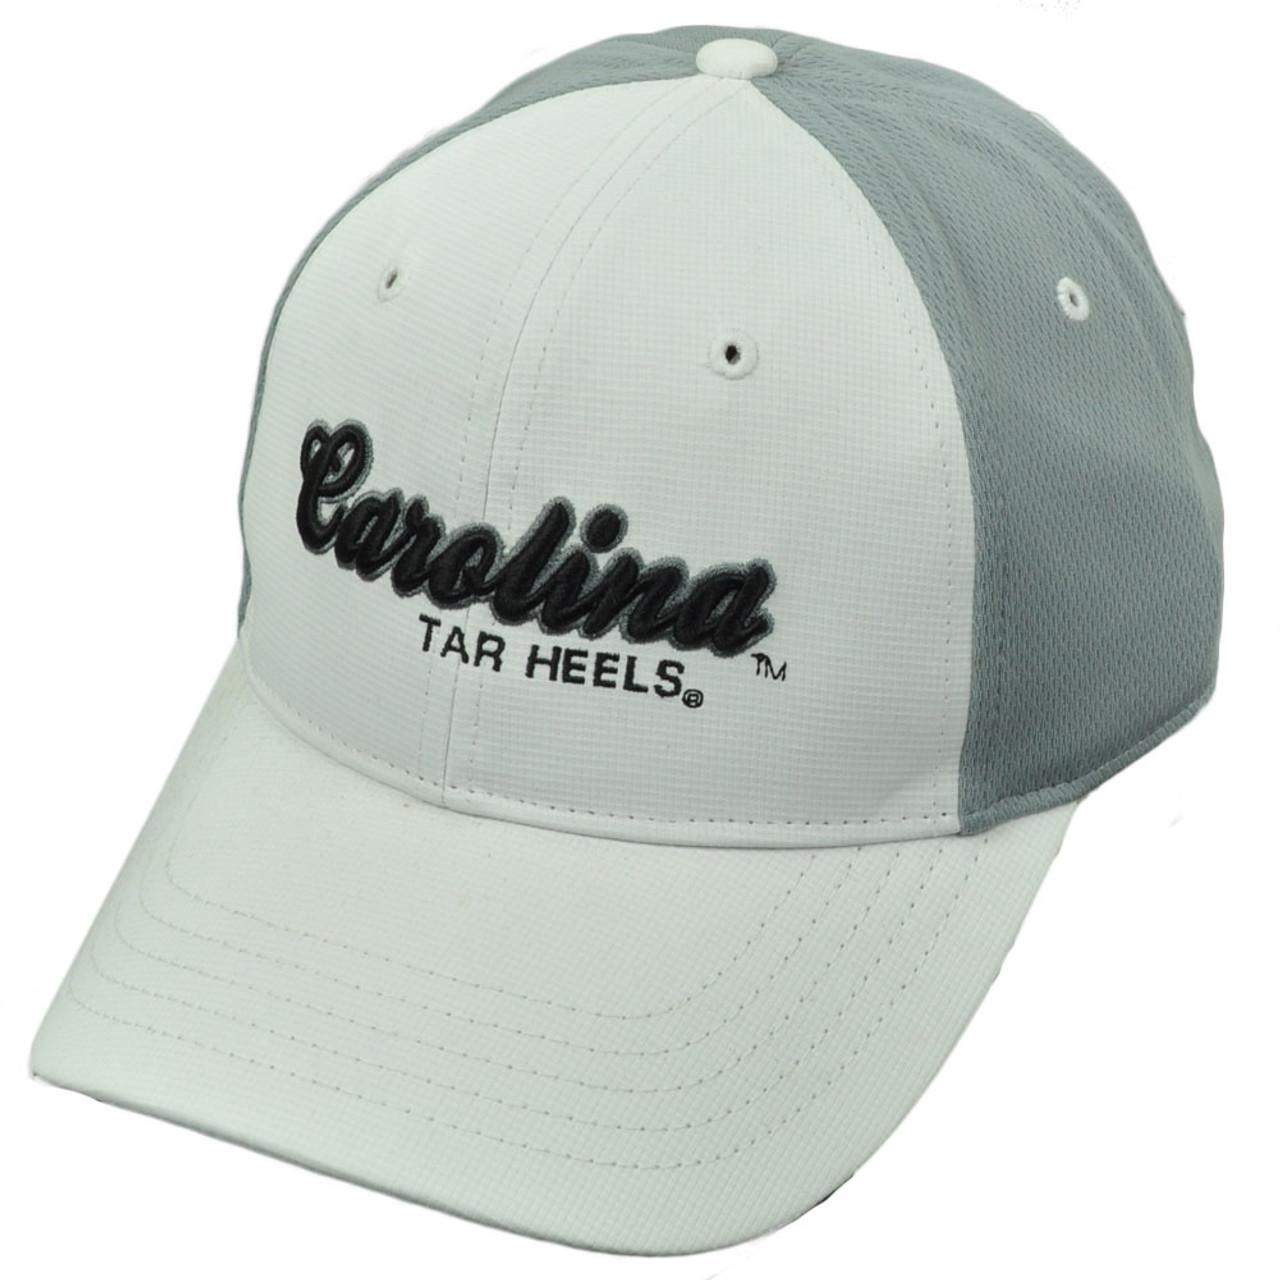 73c5848b88 NCAA North Carolina Tar Heels Two Tone White Gray Script Logo Hat Cap  Adjustable